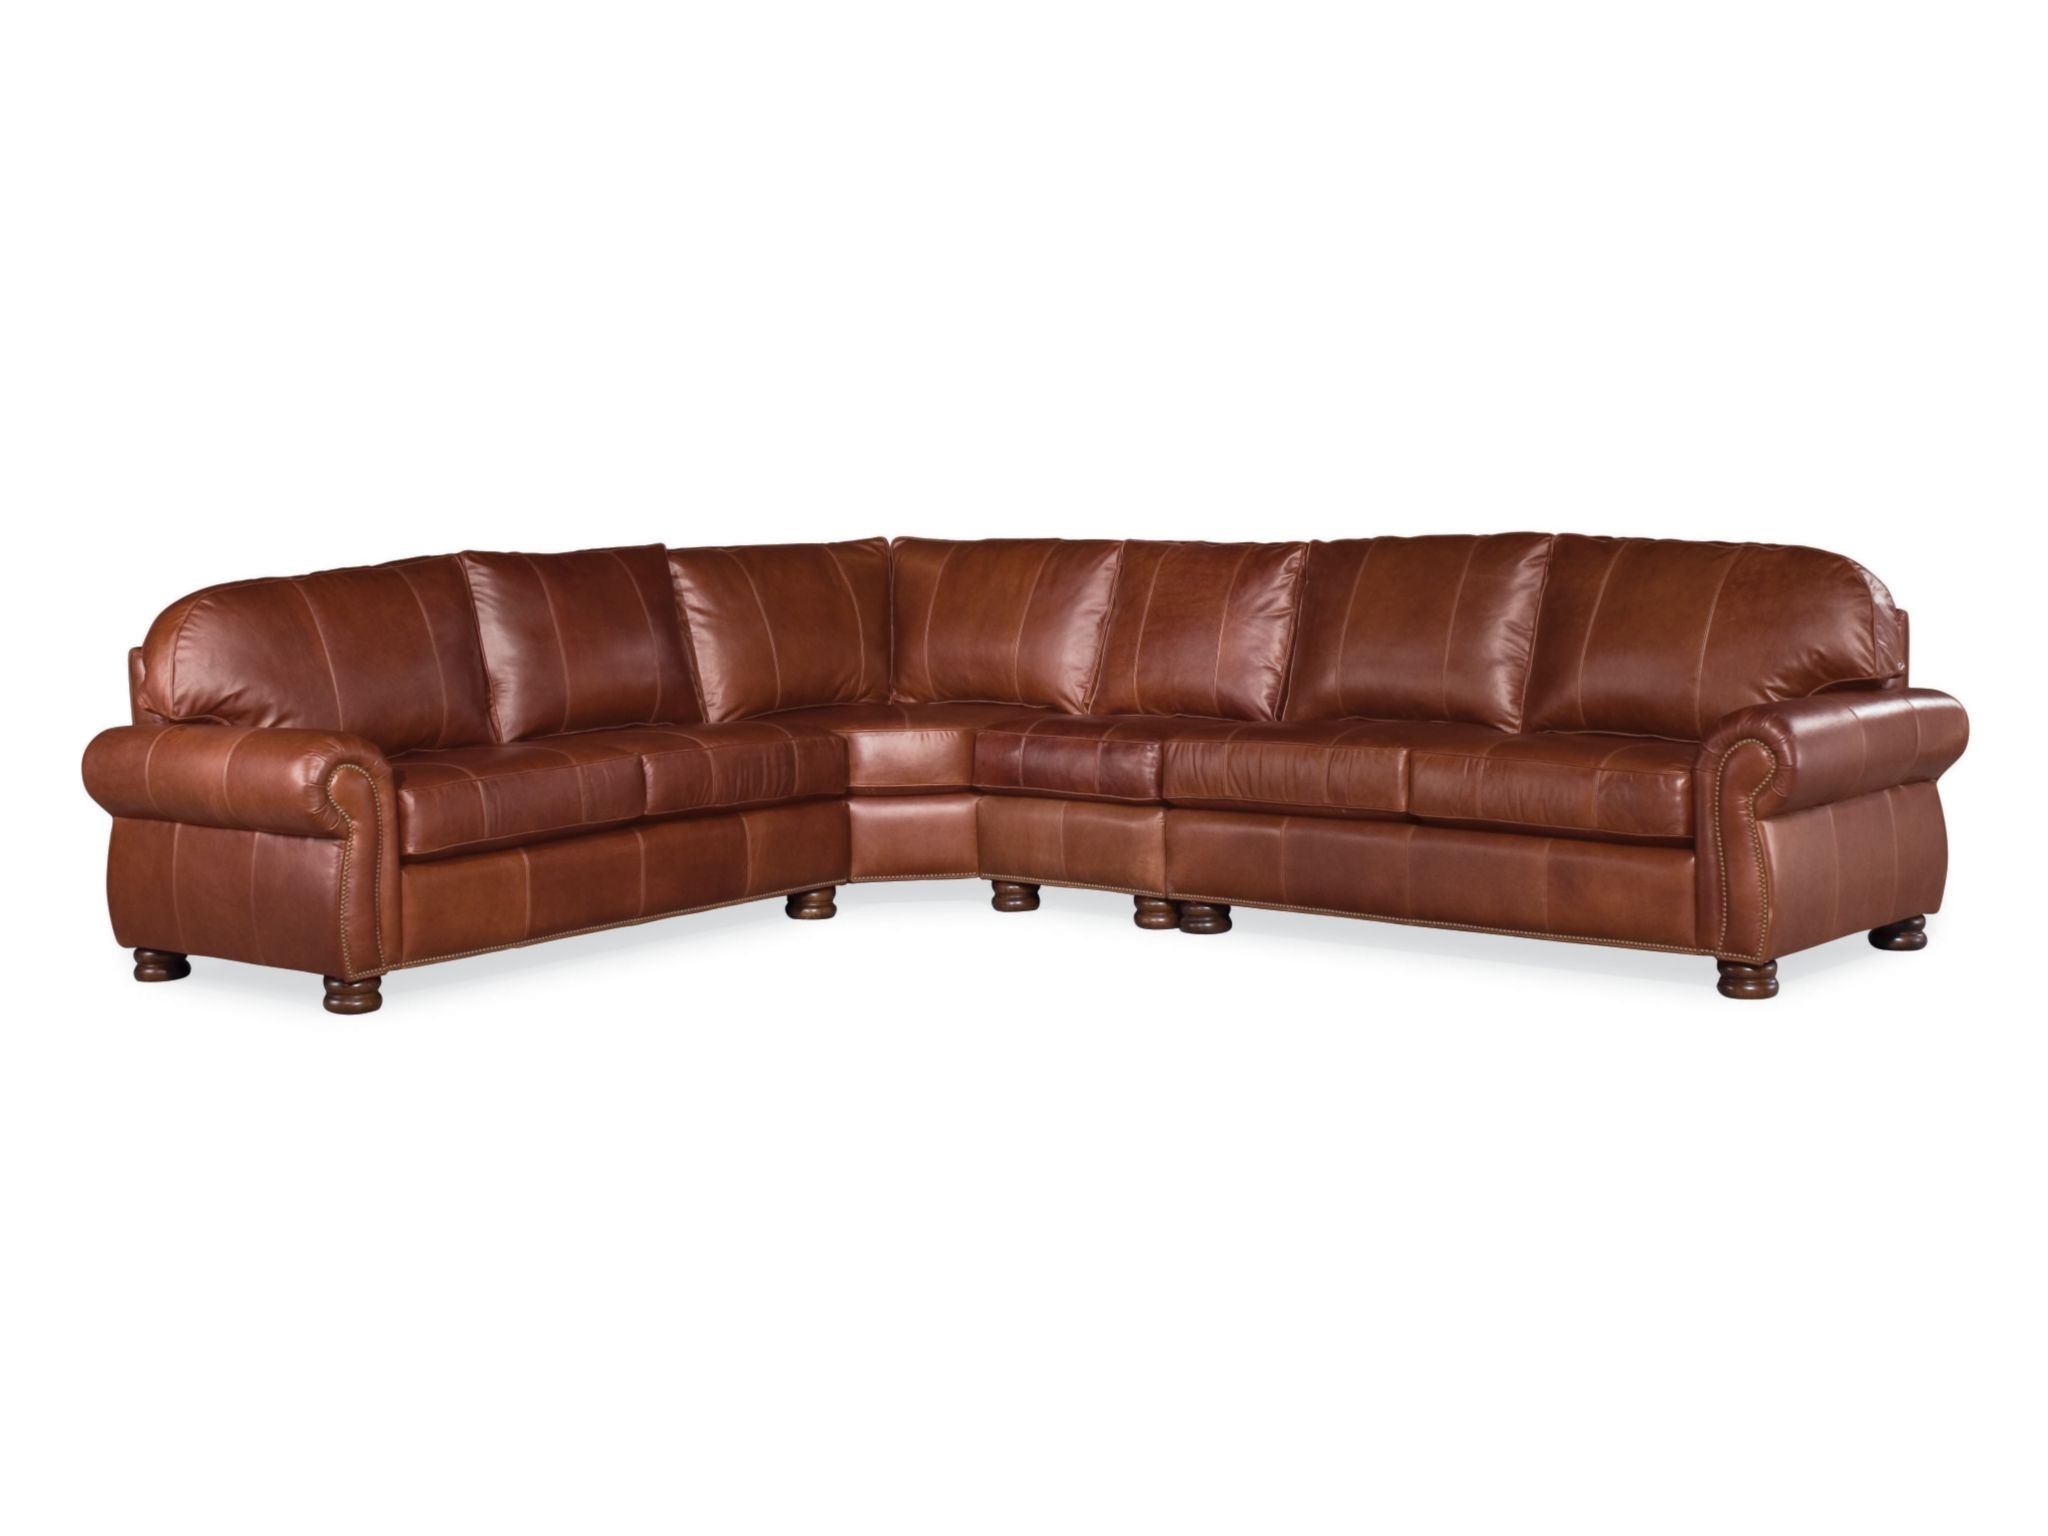 thomasville benjamin sofa roche bobois mah jong precio living room sectional hs1461 sect